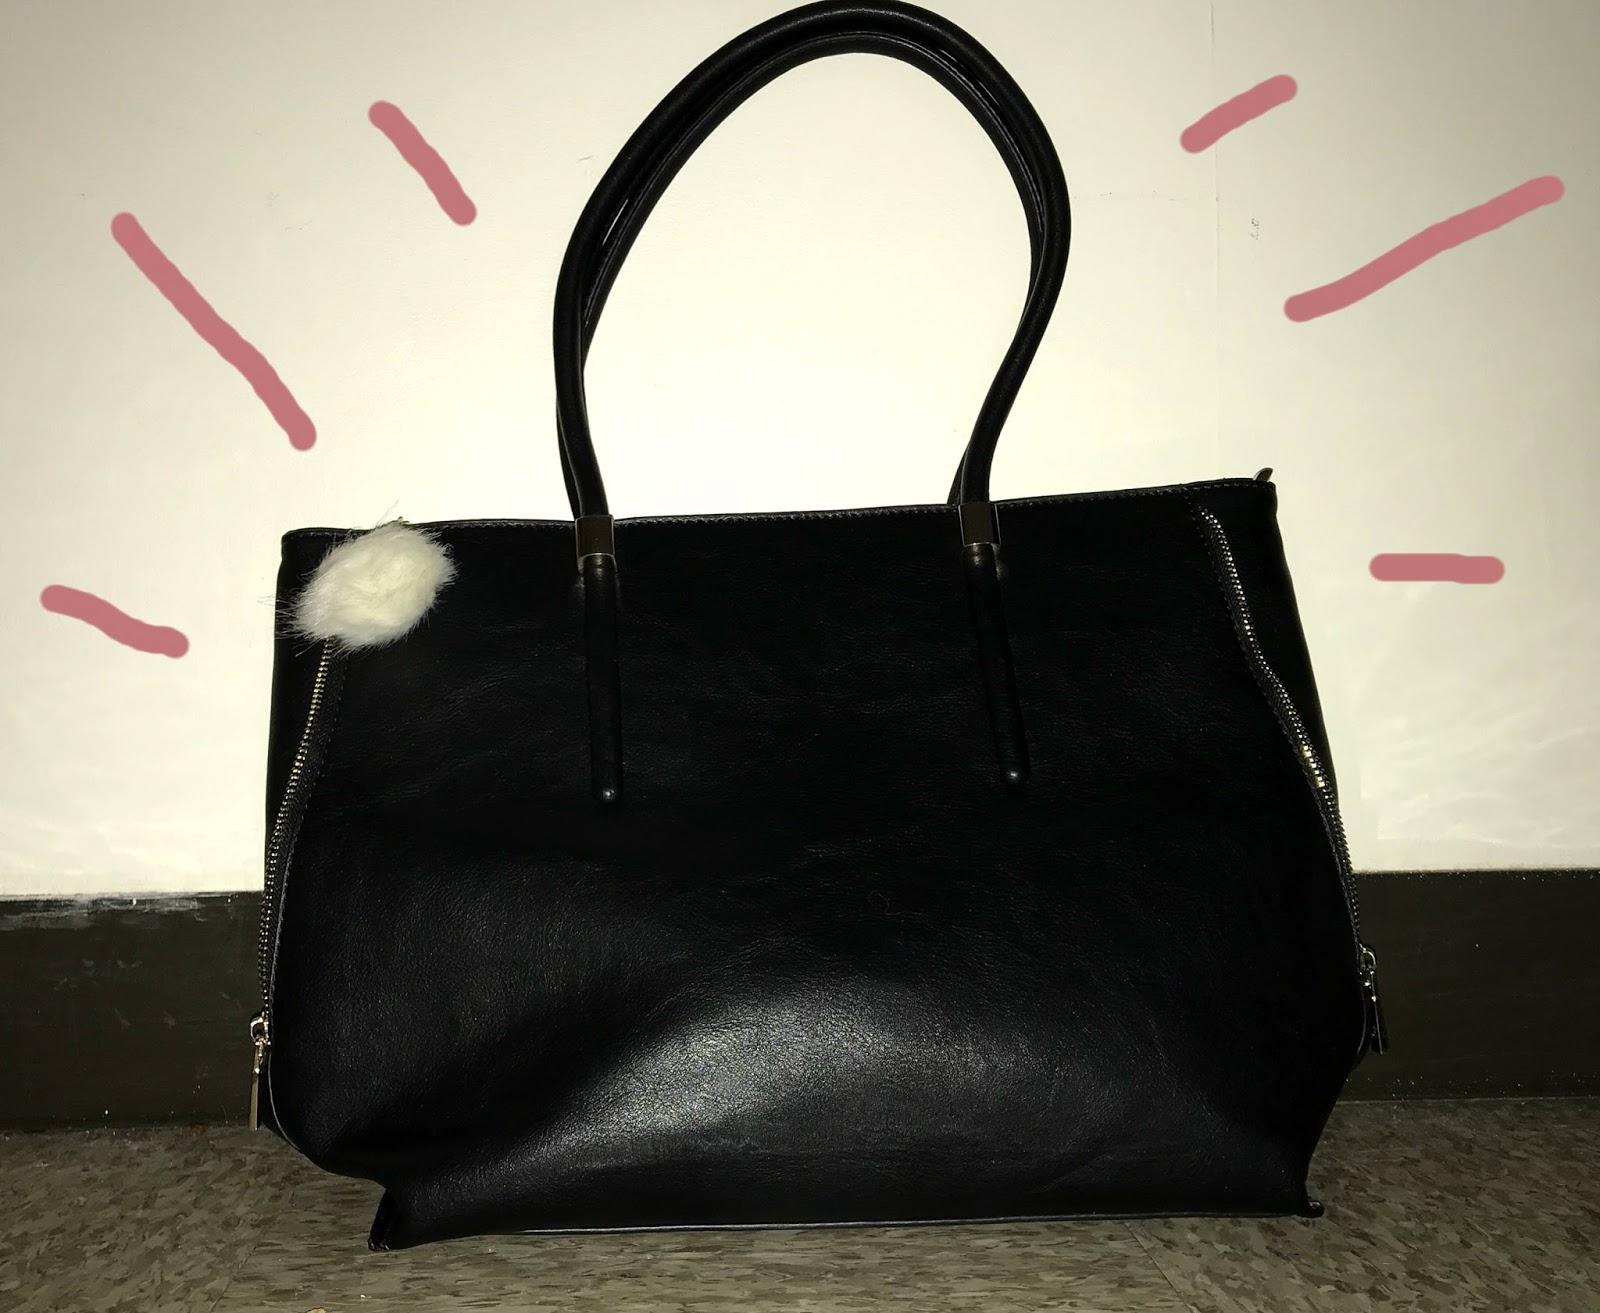 Uk Based Handbag Brand Anna Grace